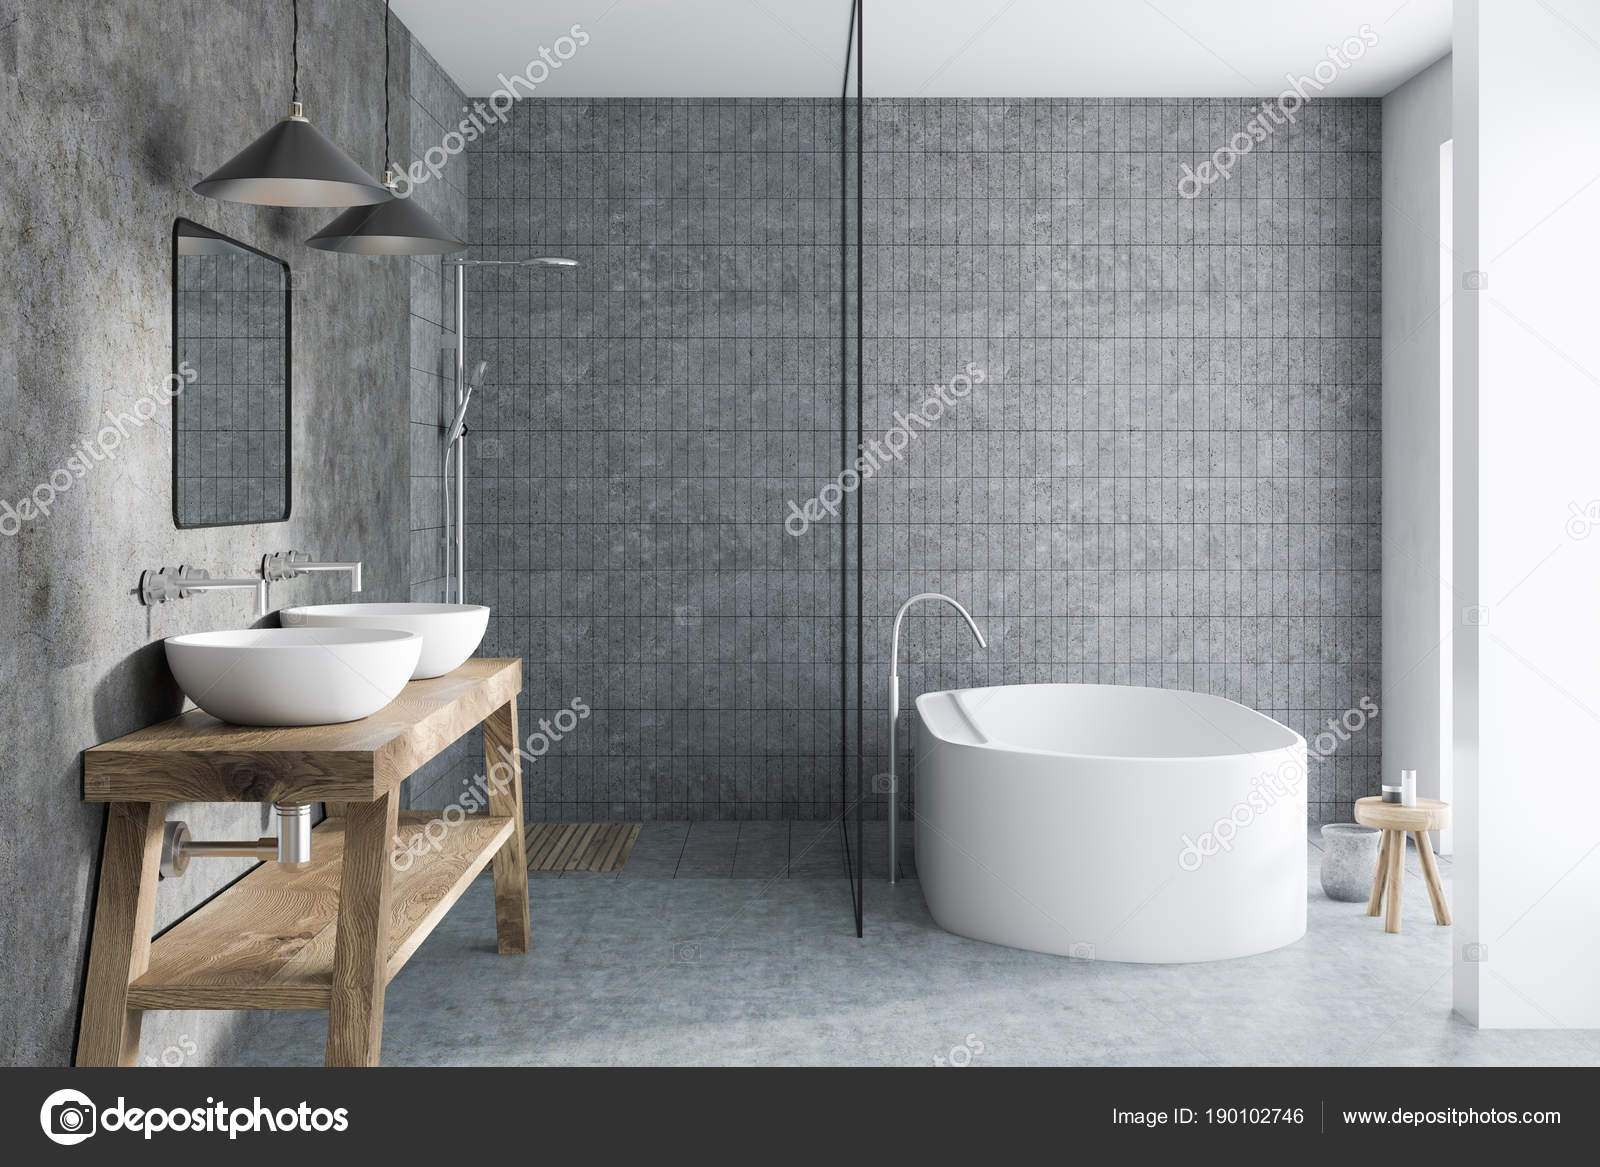 Grigio piastrelle bagno interni u foto stock denisismagilov